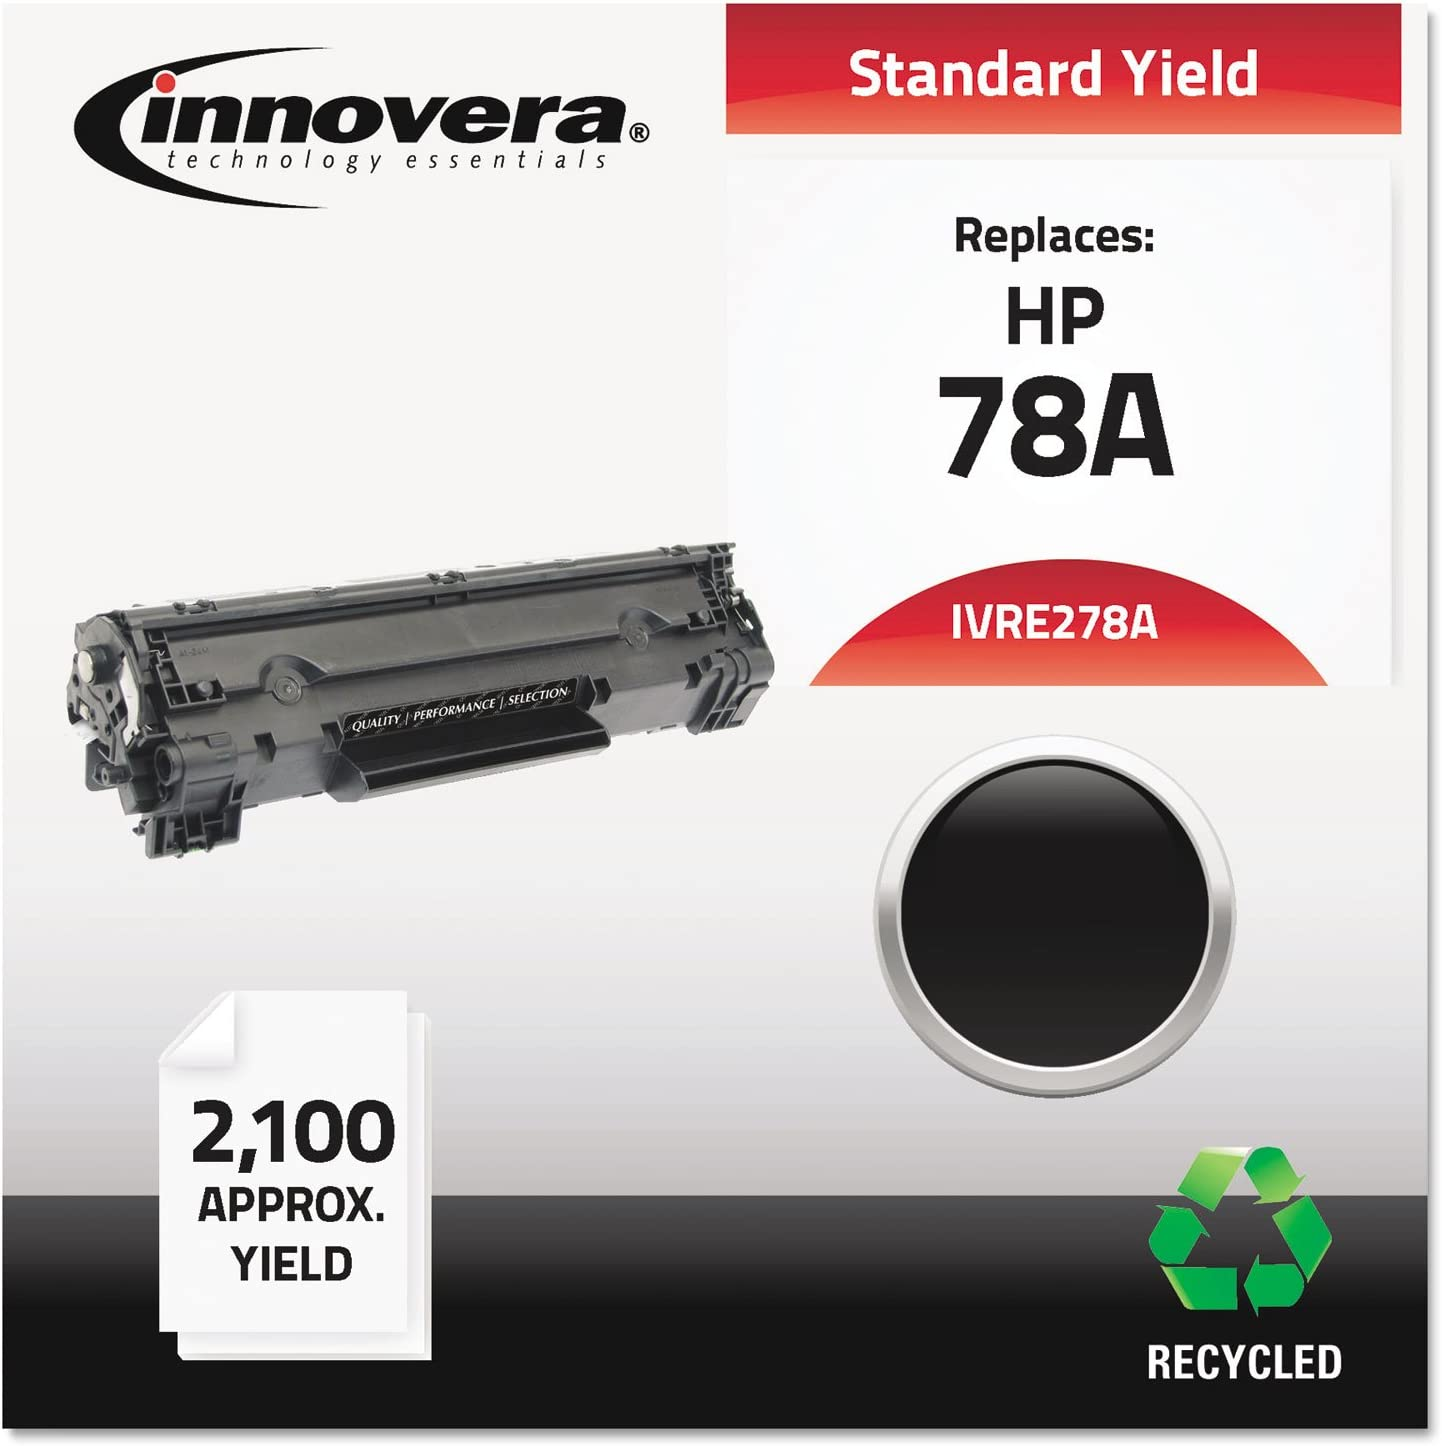 IVRE278A Innovera Remanufactured CE278A 78A Laser Toner